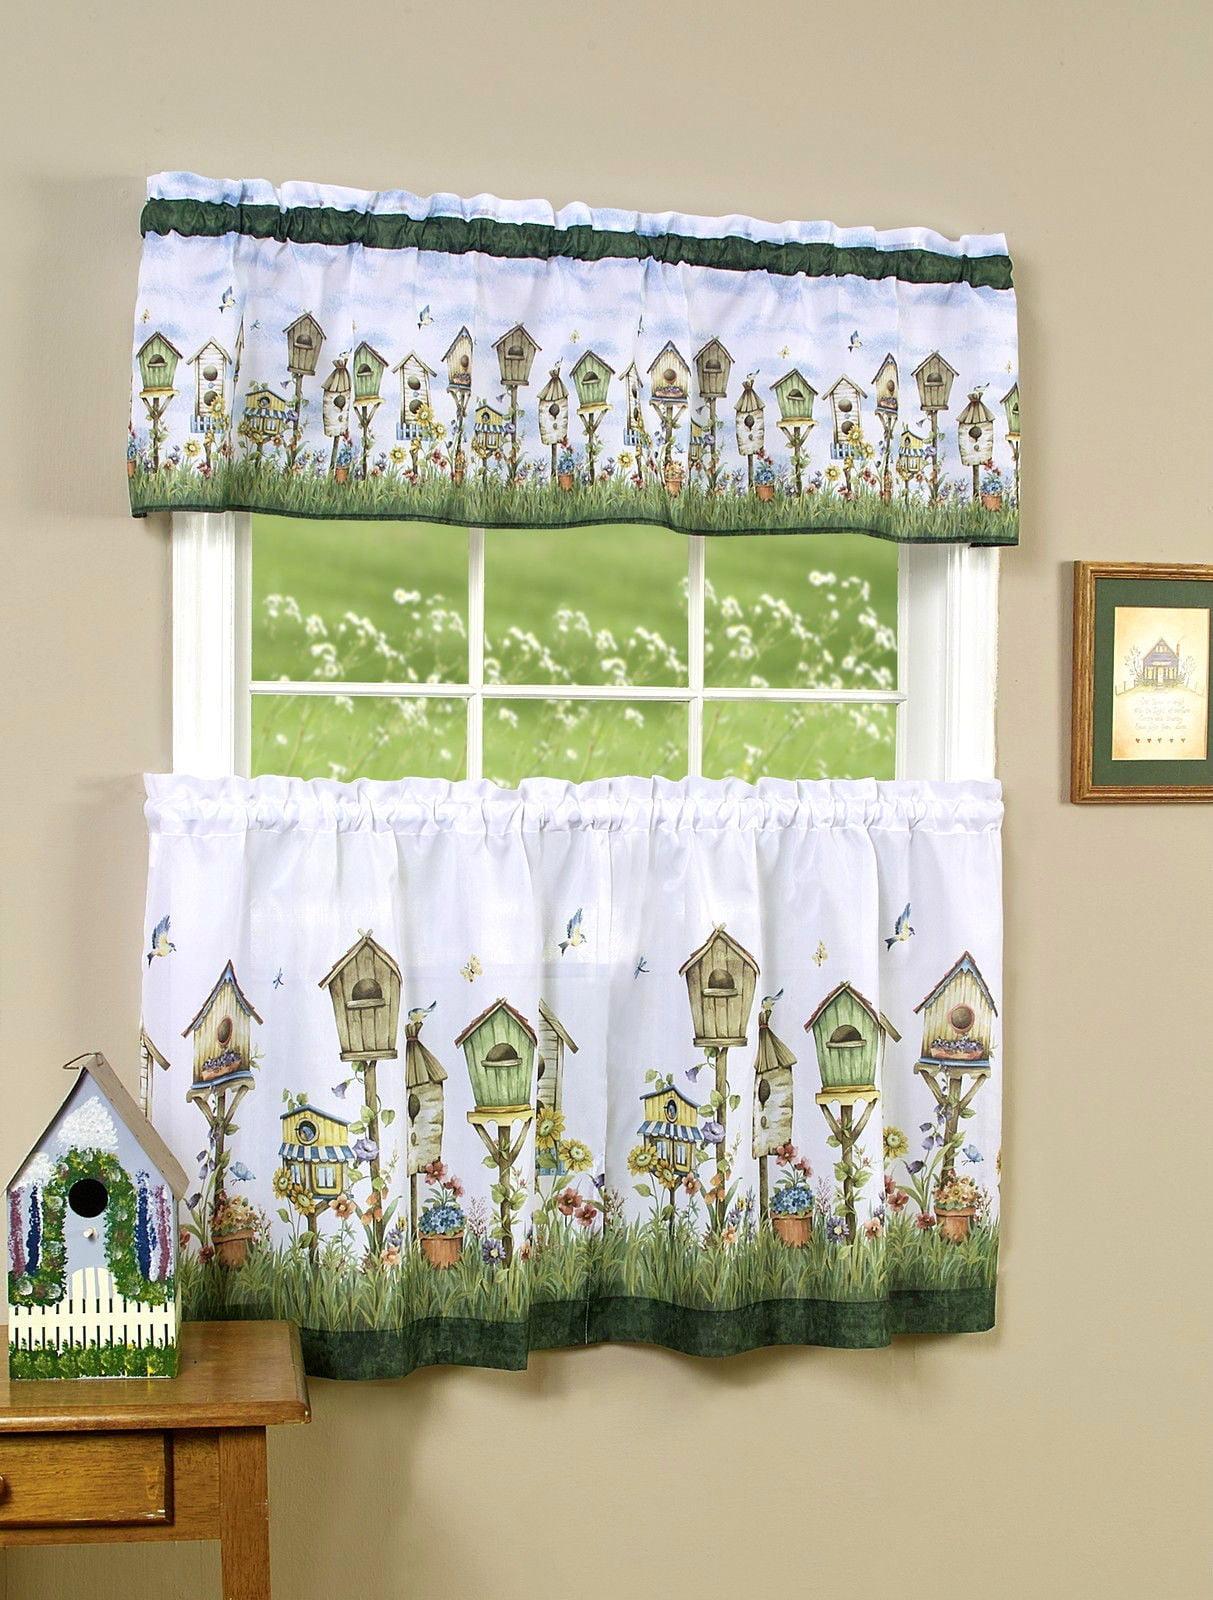 Window bird house - Birdhouse 3 Piece Kitchen Curtain Tier Valance Set 36 In Long Walmart Com